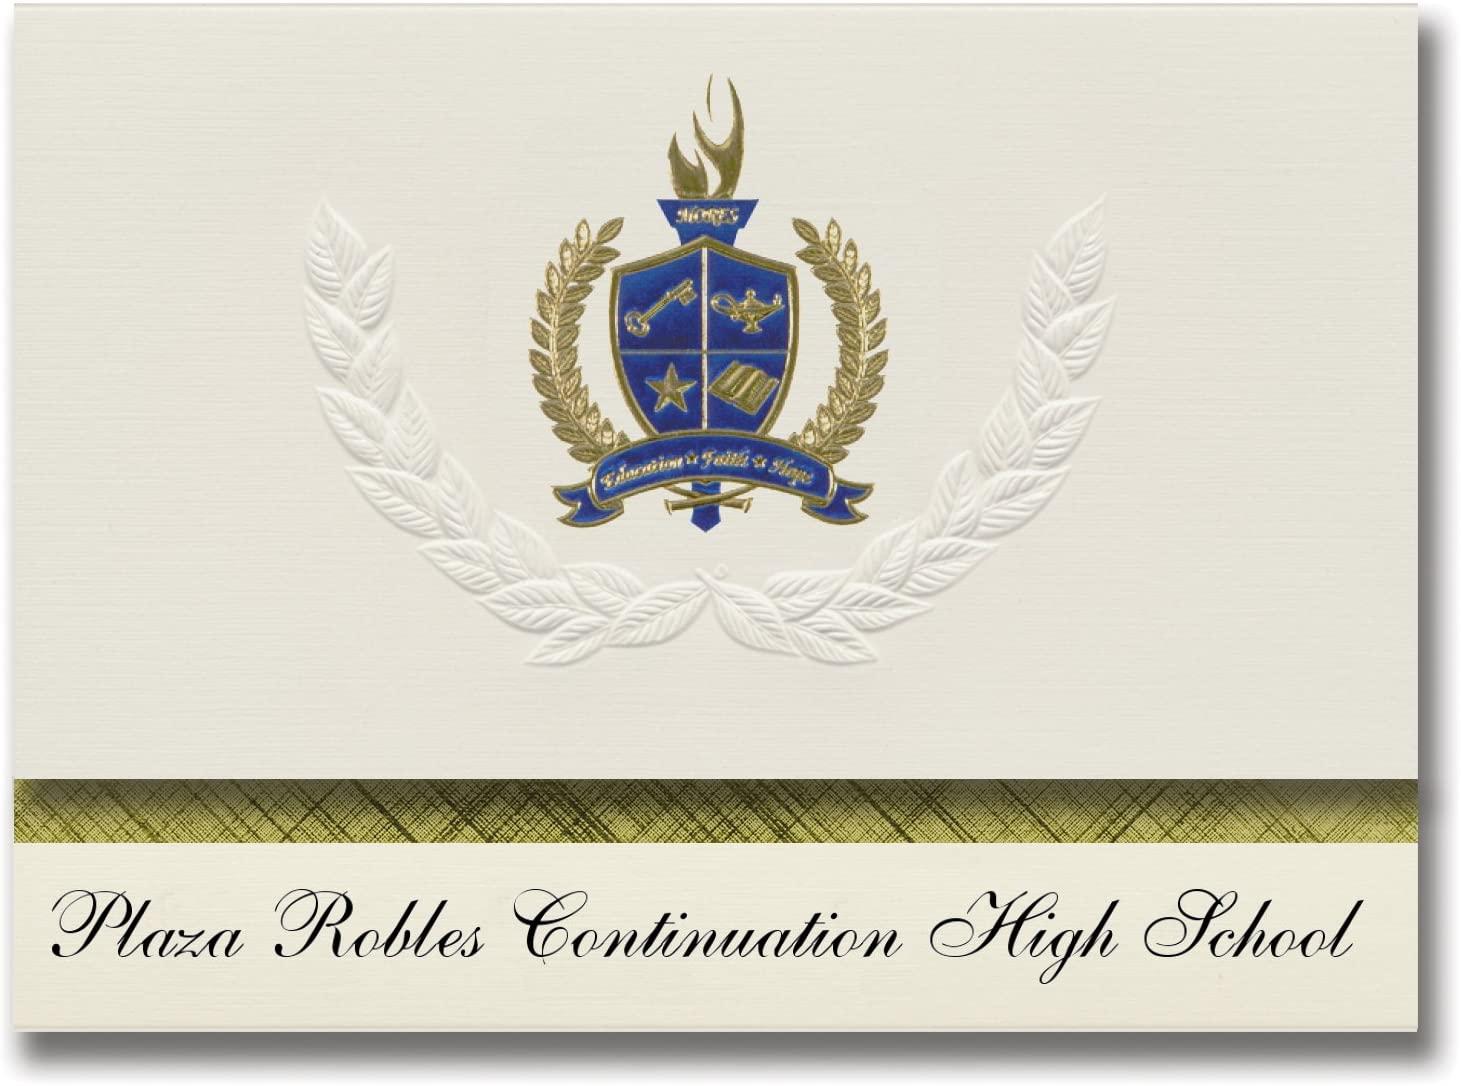 Signature Announcements Plaza Robles Continuation High School (Stockton, CA) Graduation Announcements, Presidential Elite Pack 25 with Gold & Blue Metallic Foil seal